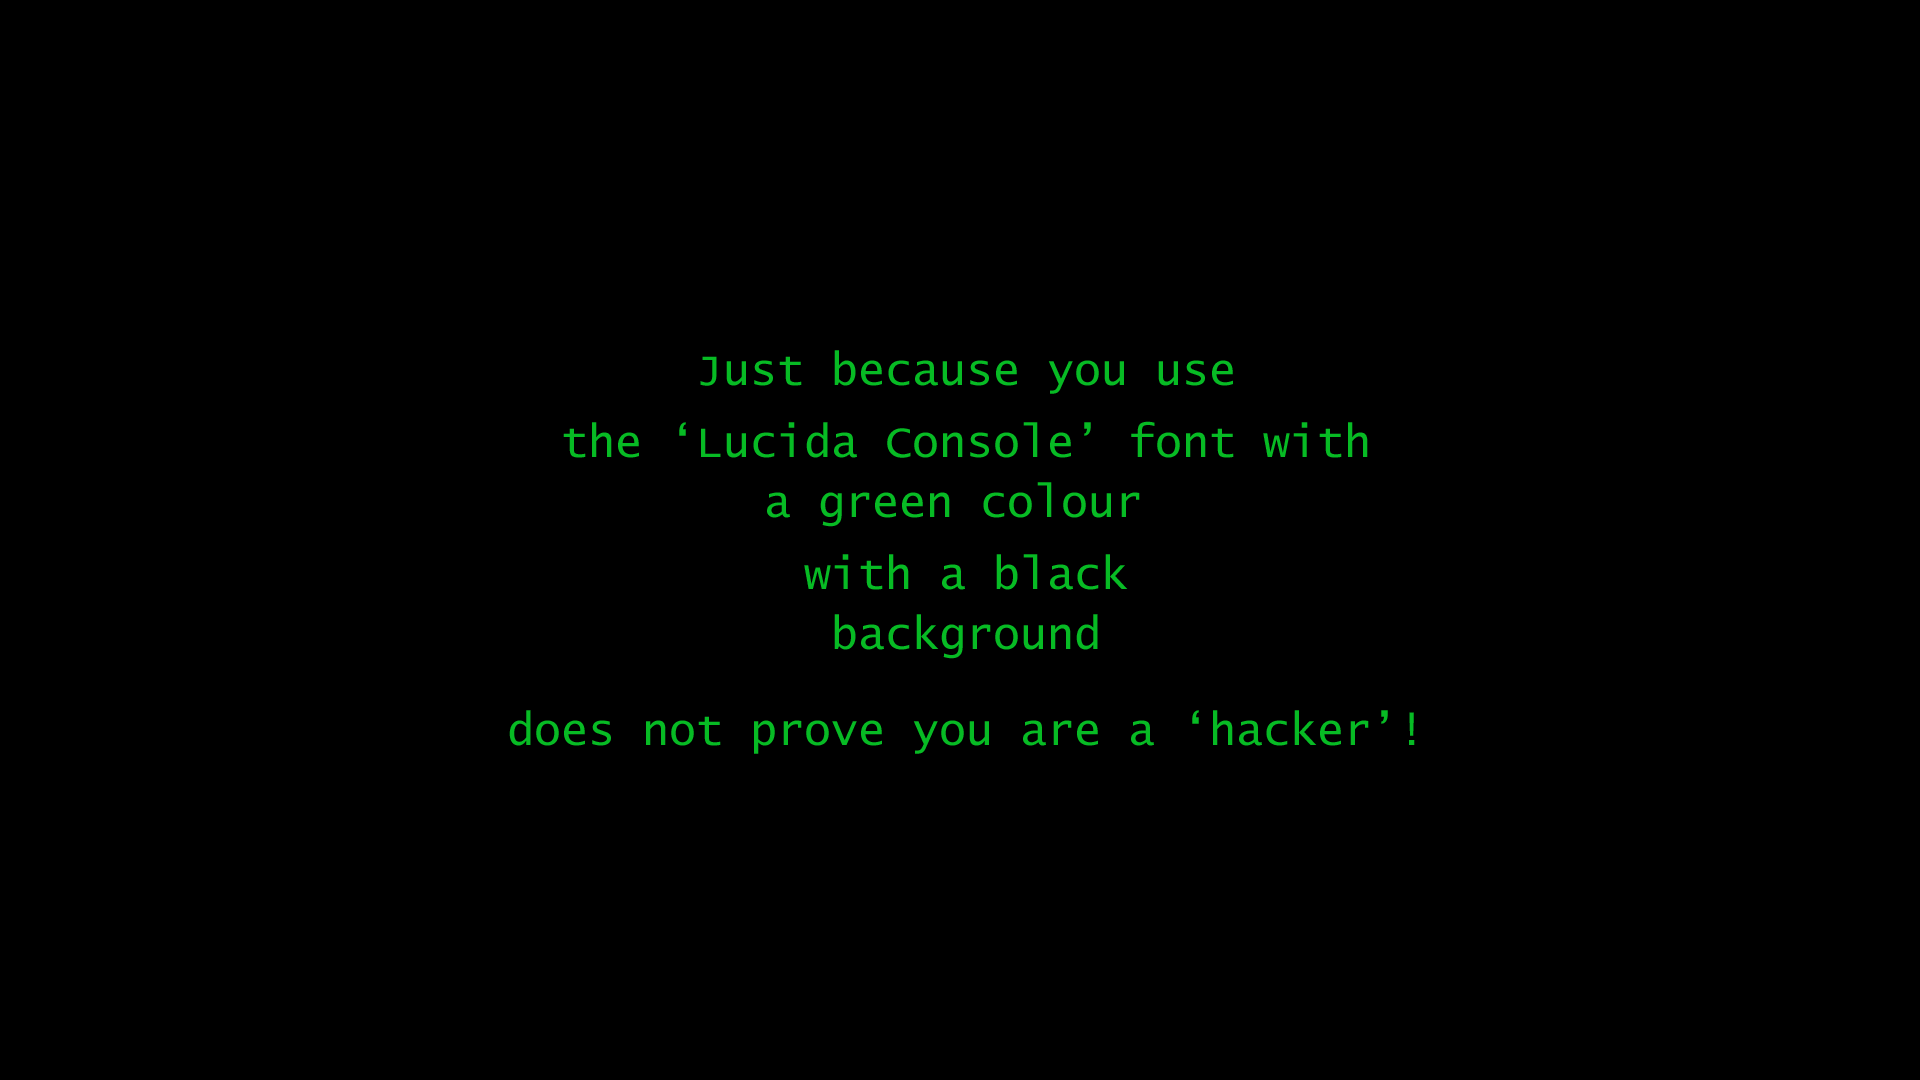 Hacker Black Green computer wallpaper 1920x1080 69646 1920x1080